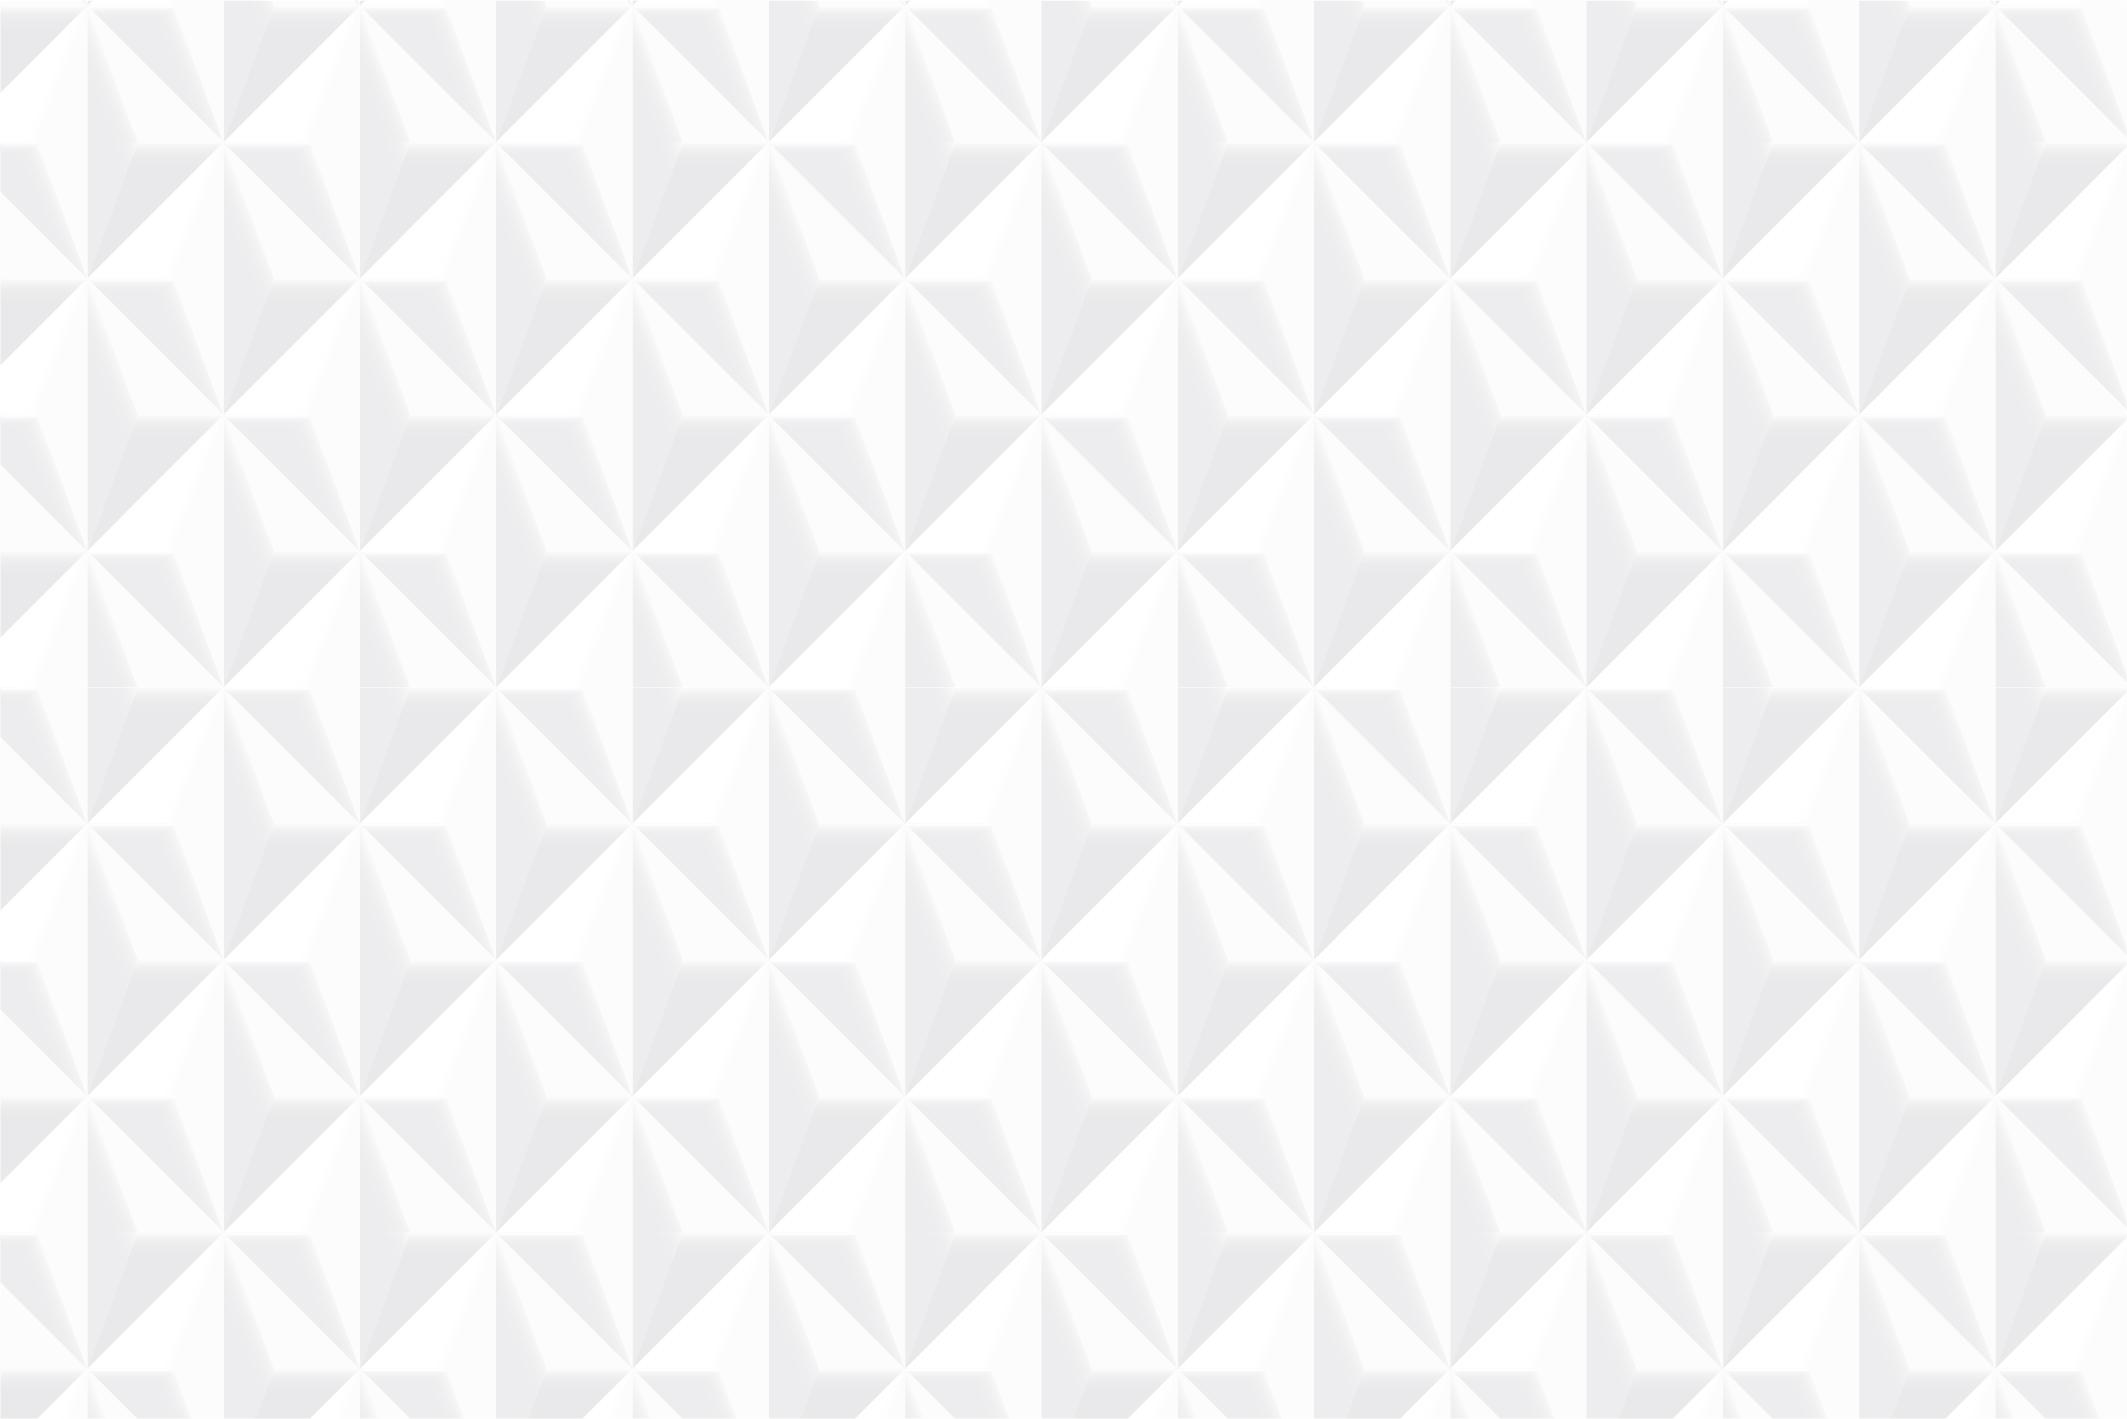 White decorative seamless textures example image 10